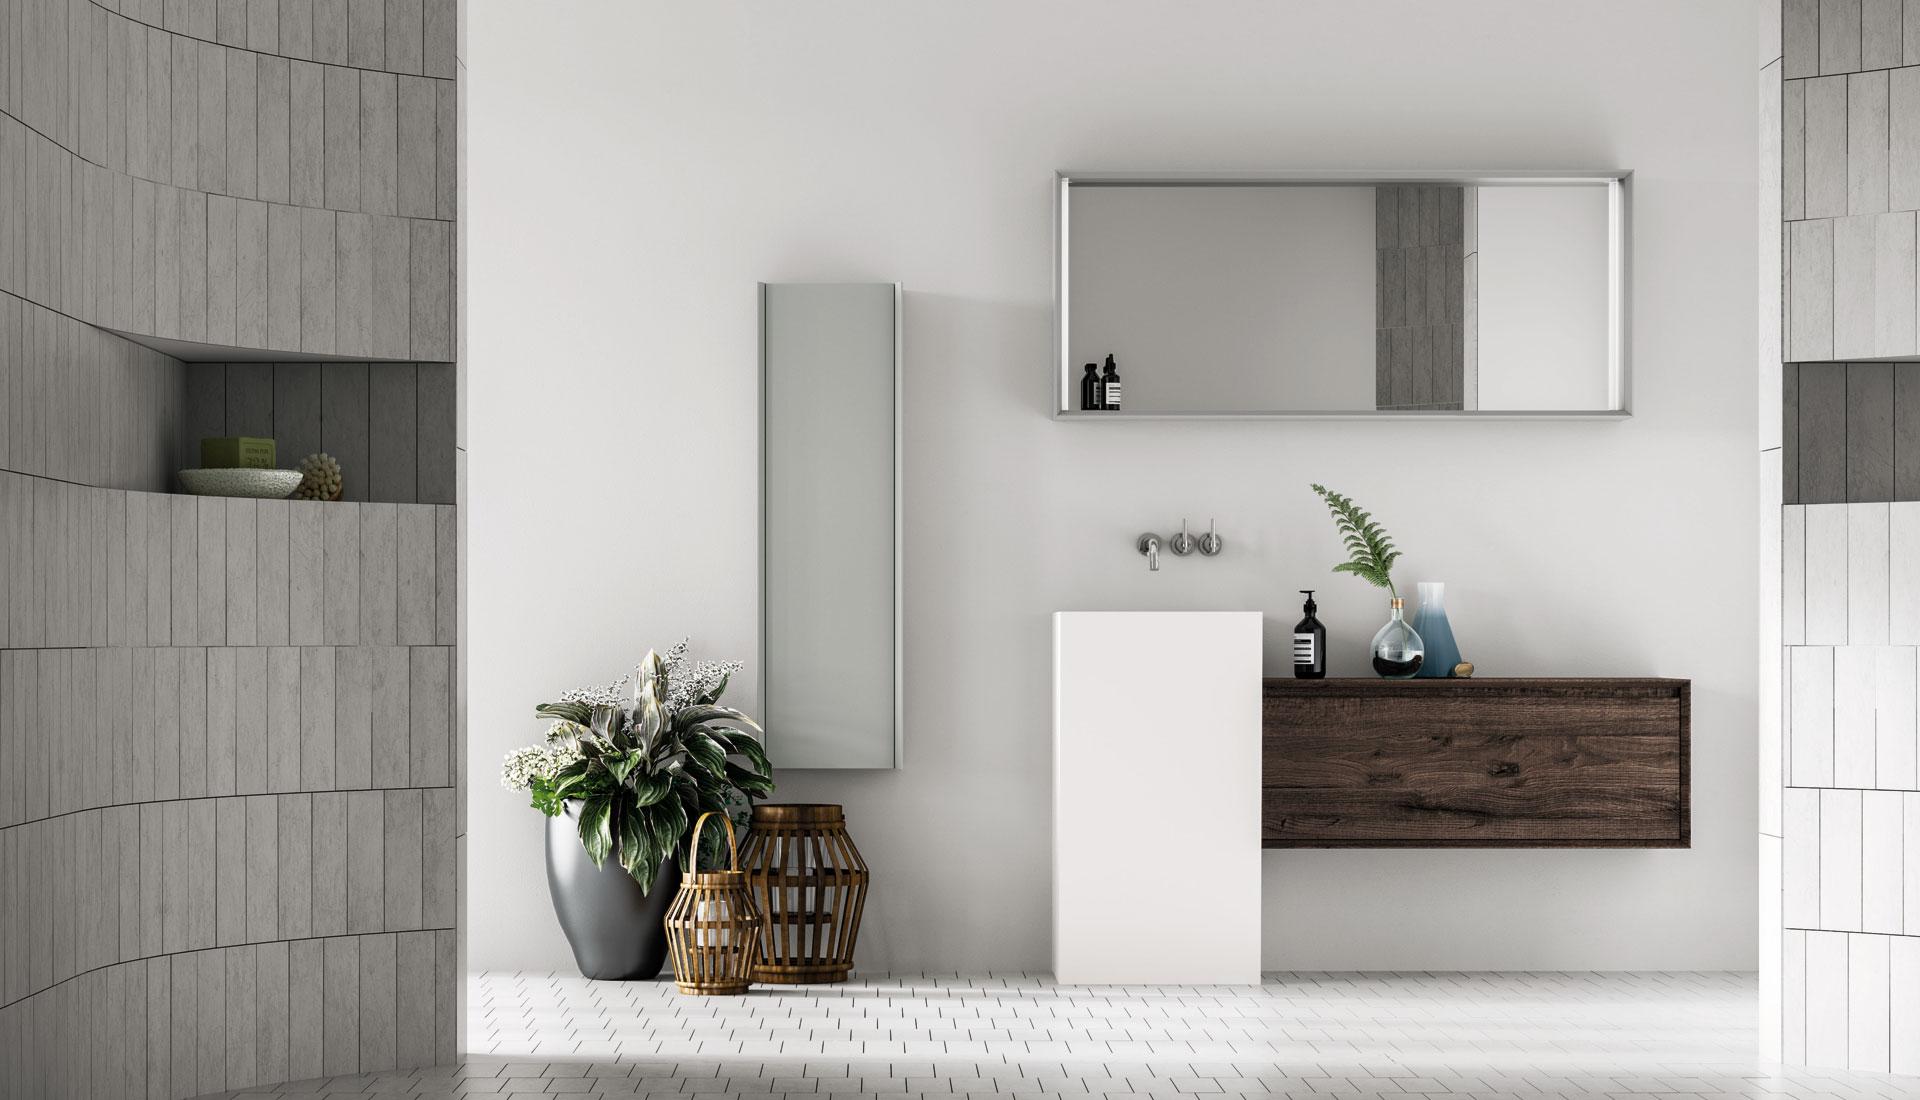 Arredo bagno puntotre mobili e arredamento bagno per la casa for Mobili per arredare casa